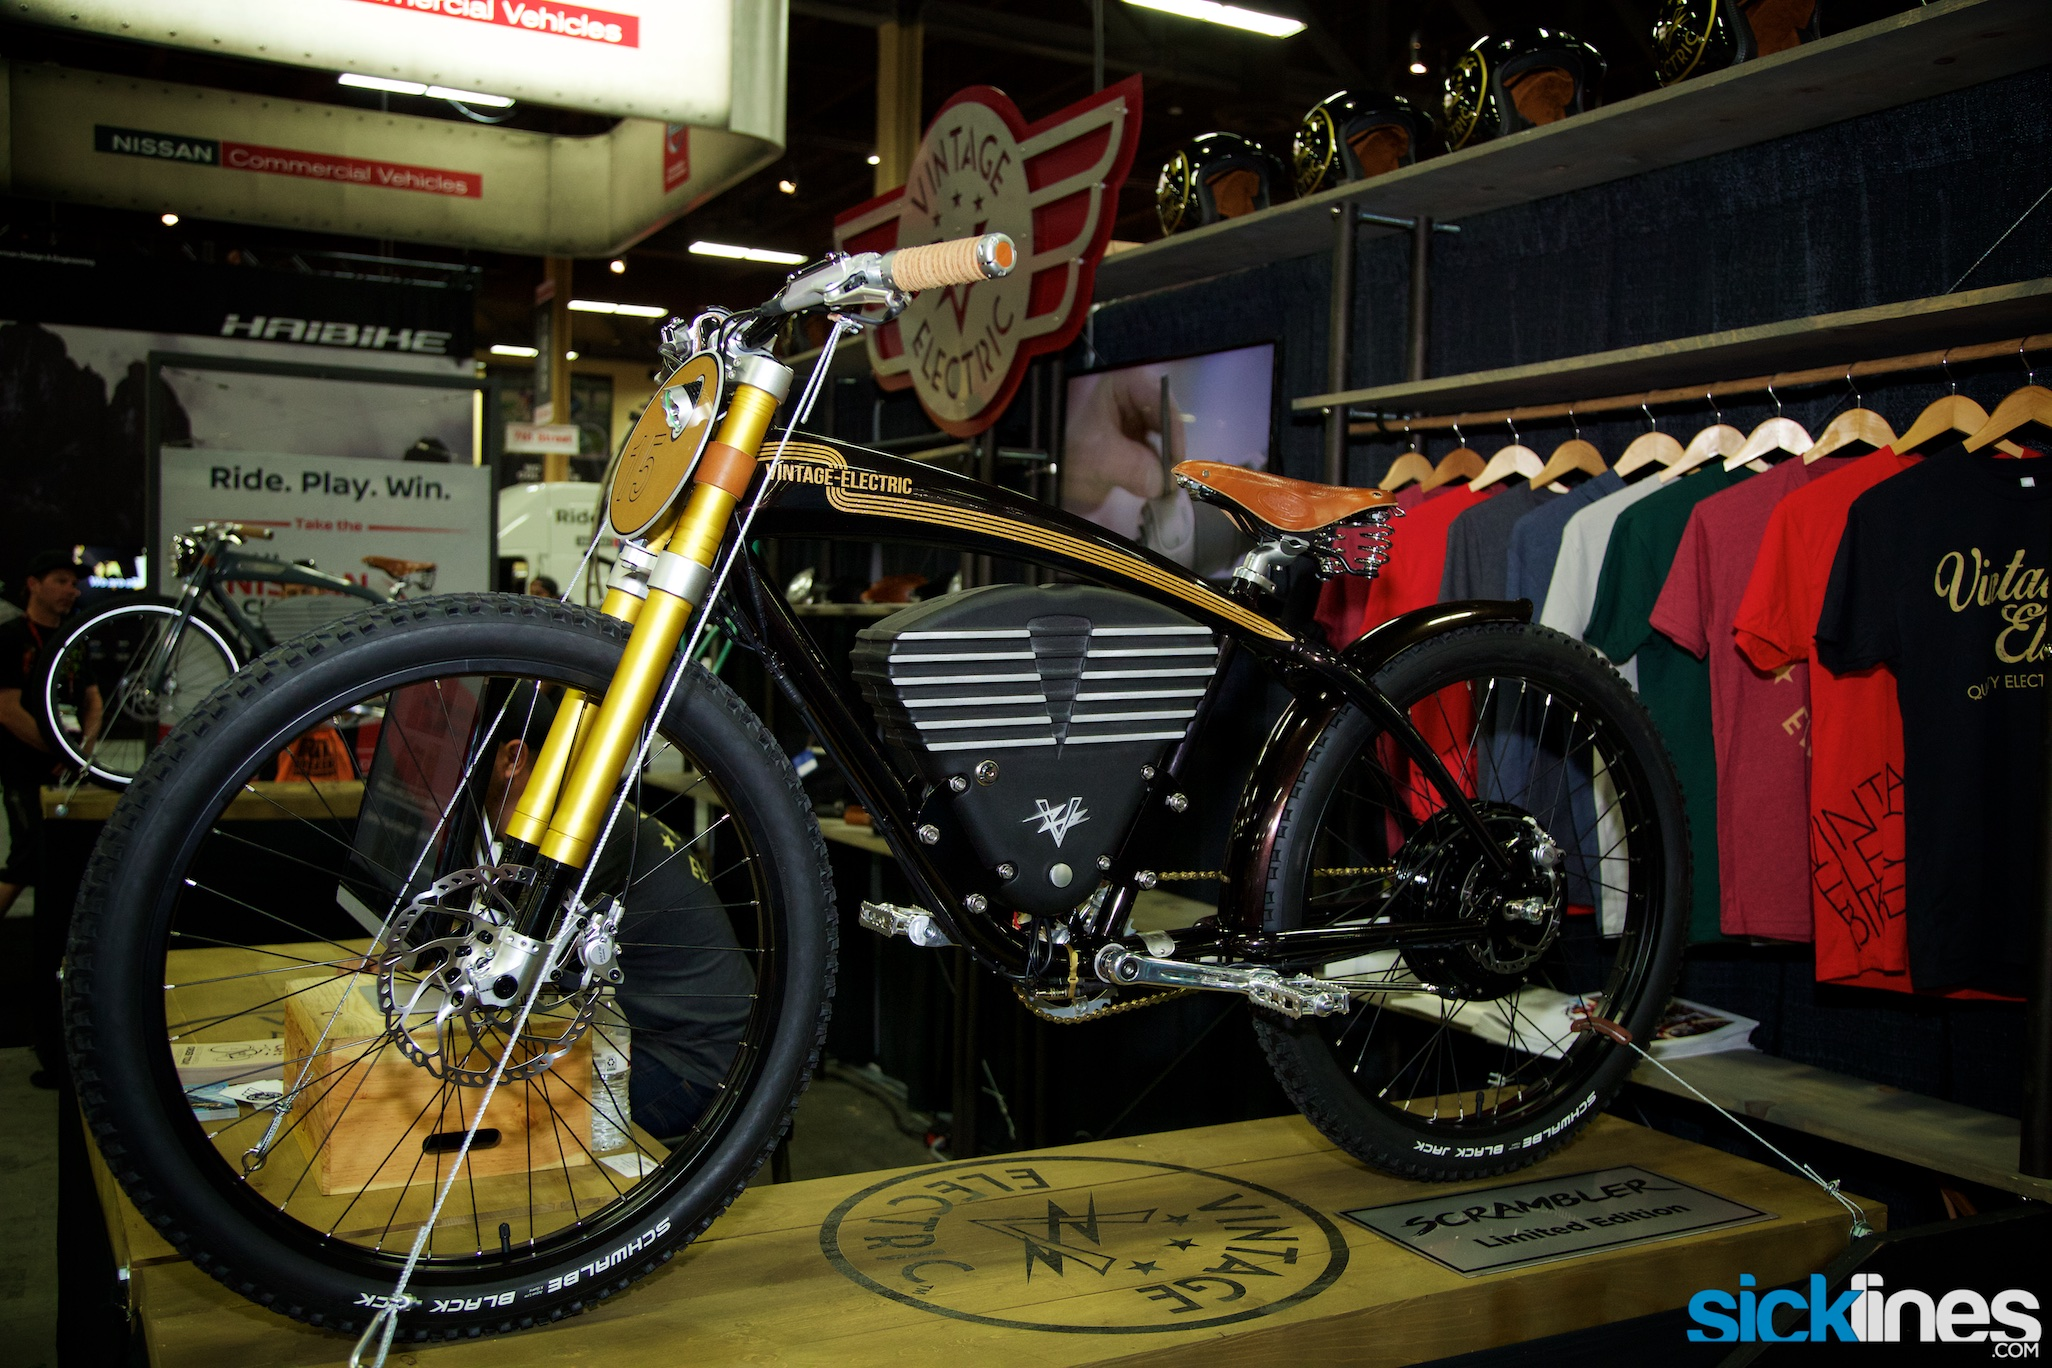 , Interbike 2016 – Vintage Electric Scrambler, Tracker S, Blackburn  Switch and Chamber HV, USB Bike Lights, Motorex Racing Fork Oil